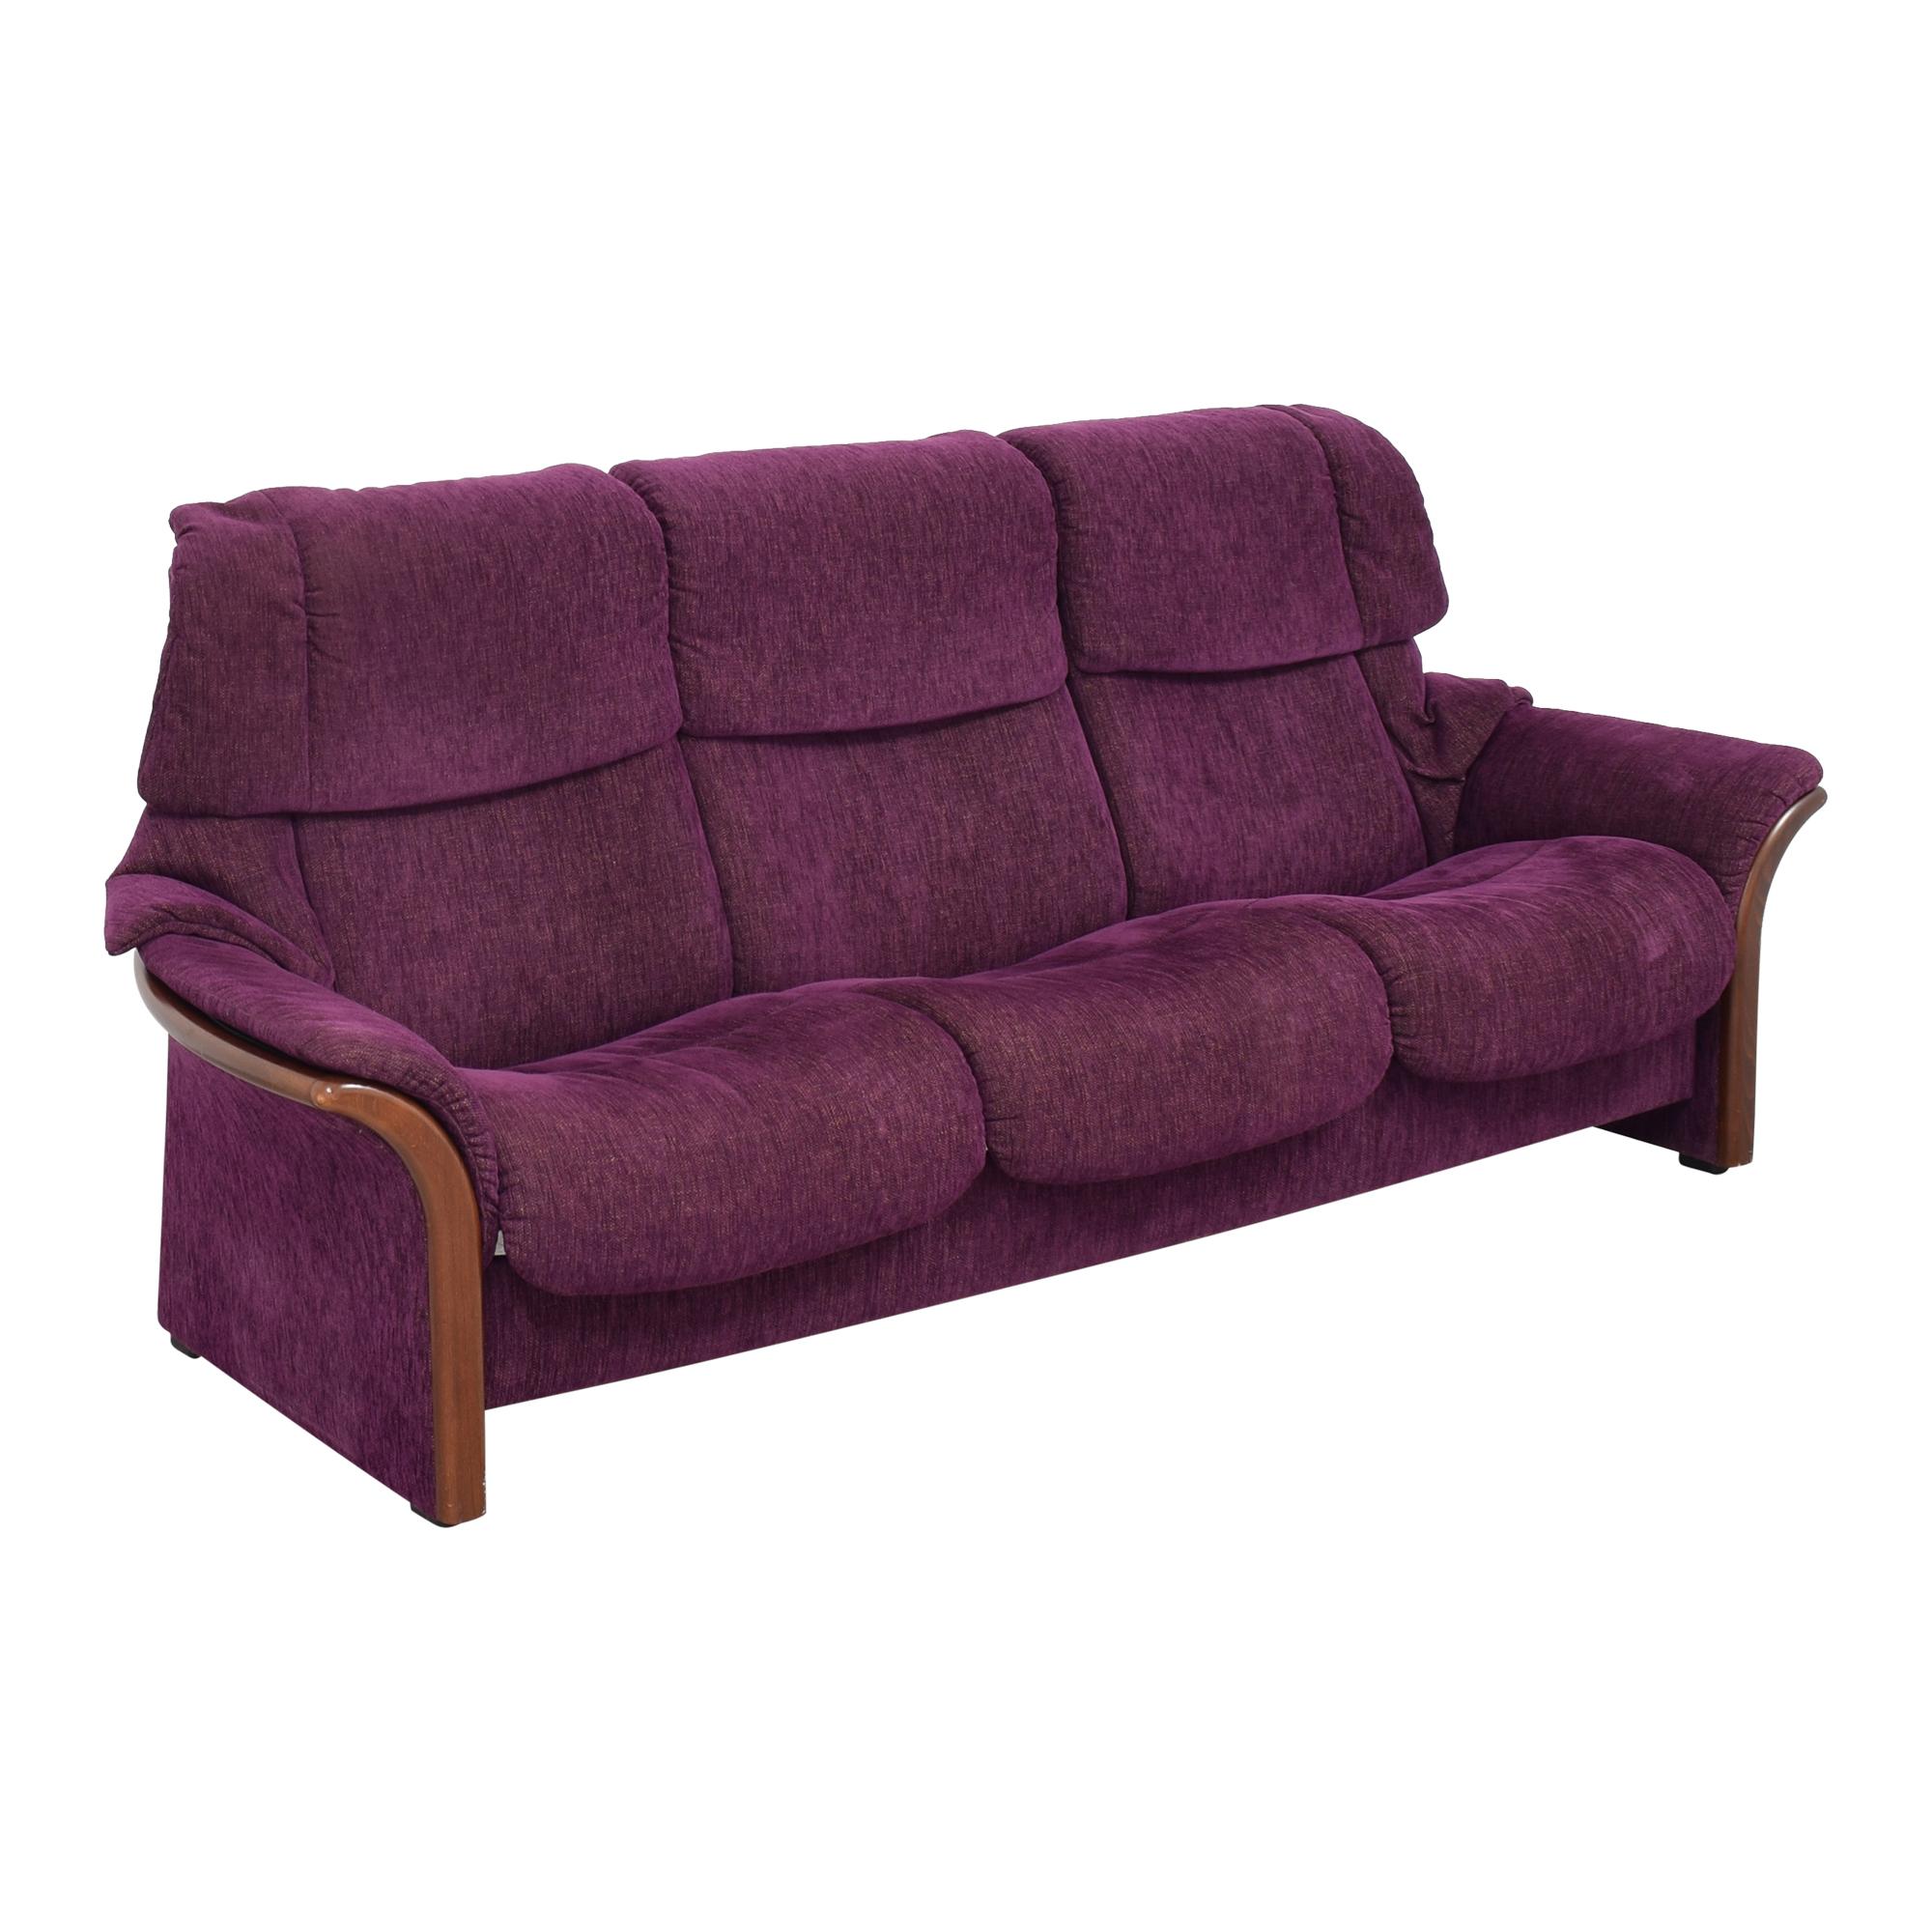 Ekornes Ekornes Stressless Eldorado High Reclining Sofa second hand